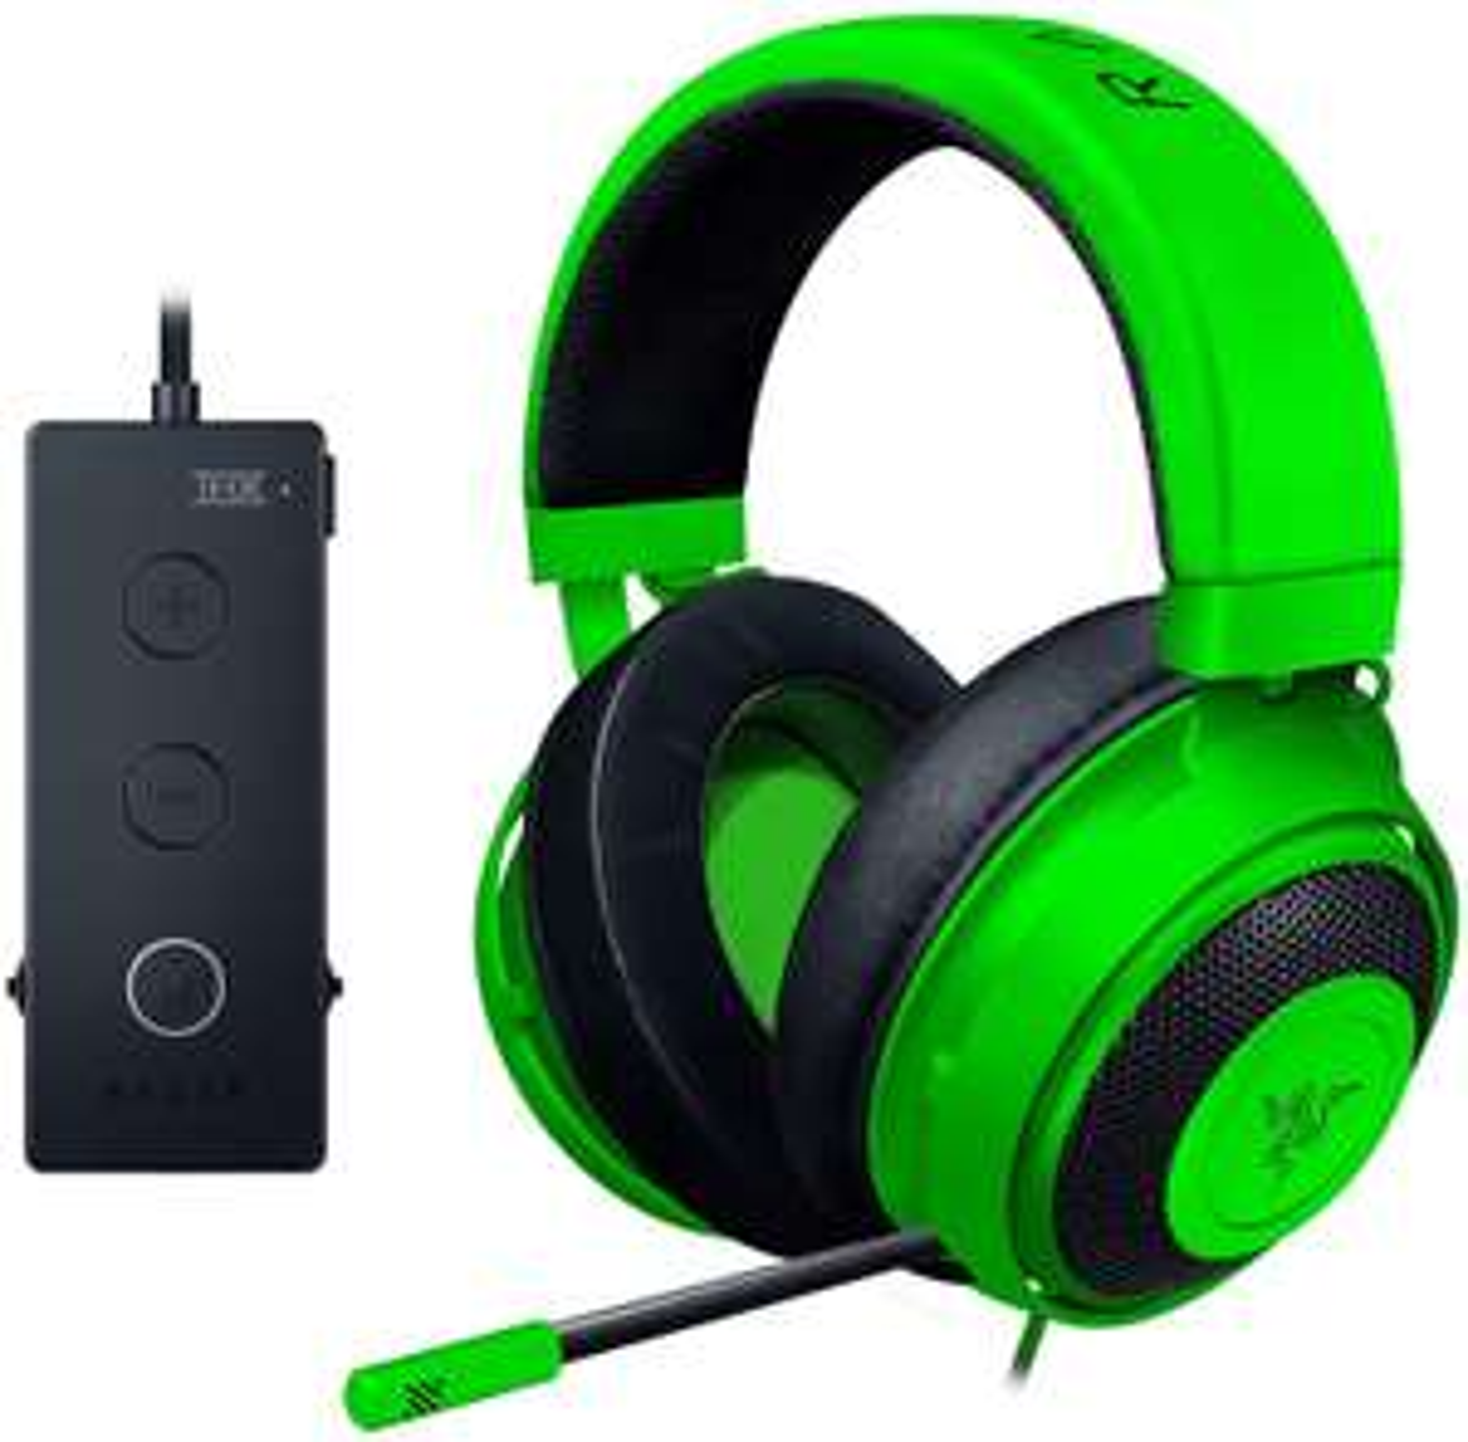 Razer Kraken Tournament Edition Wired Headset - £61.99 @ Amazon